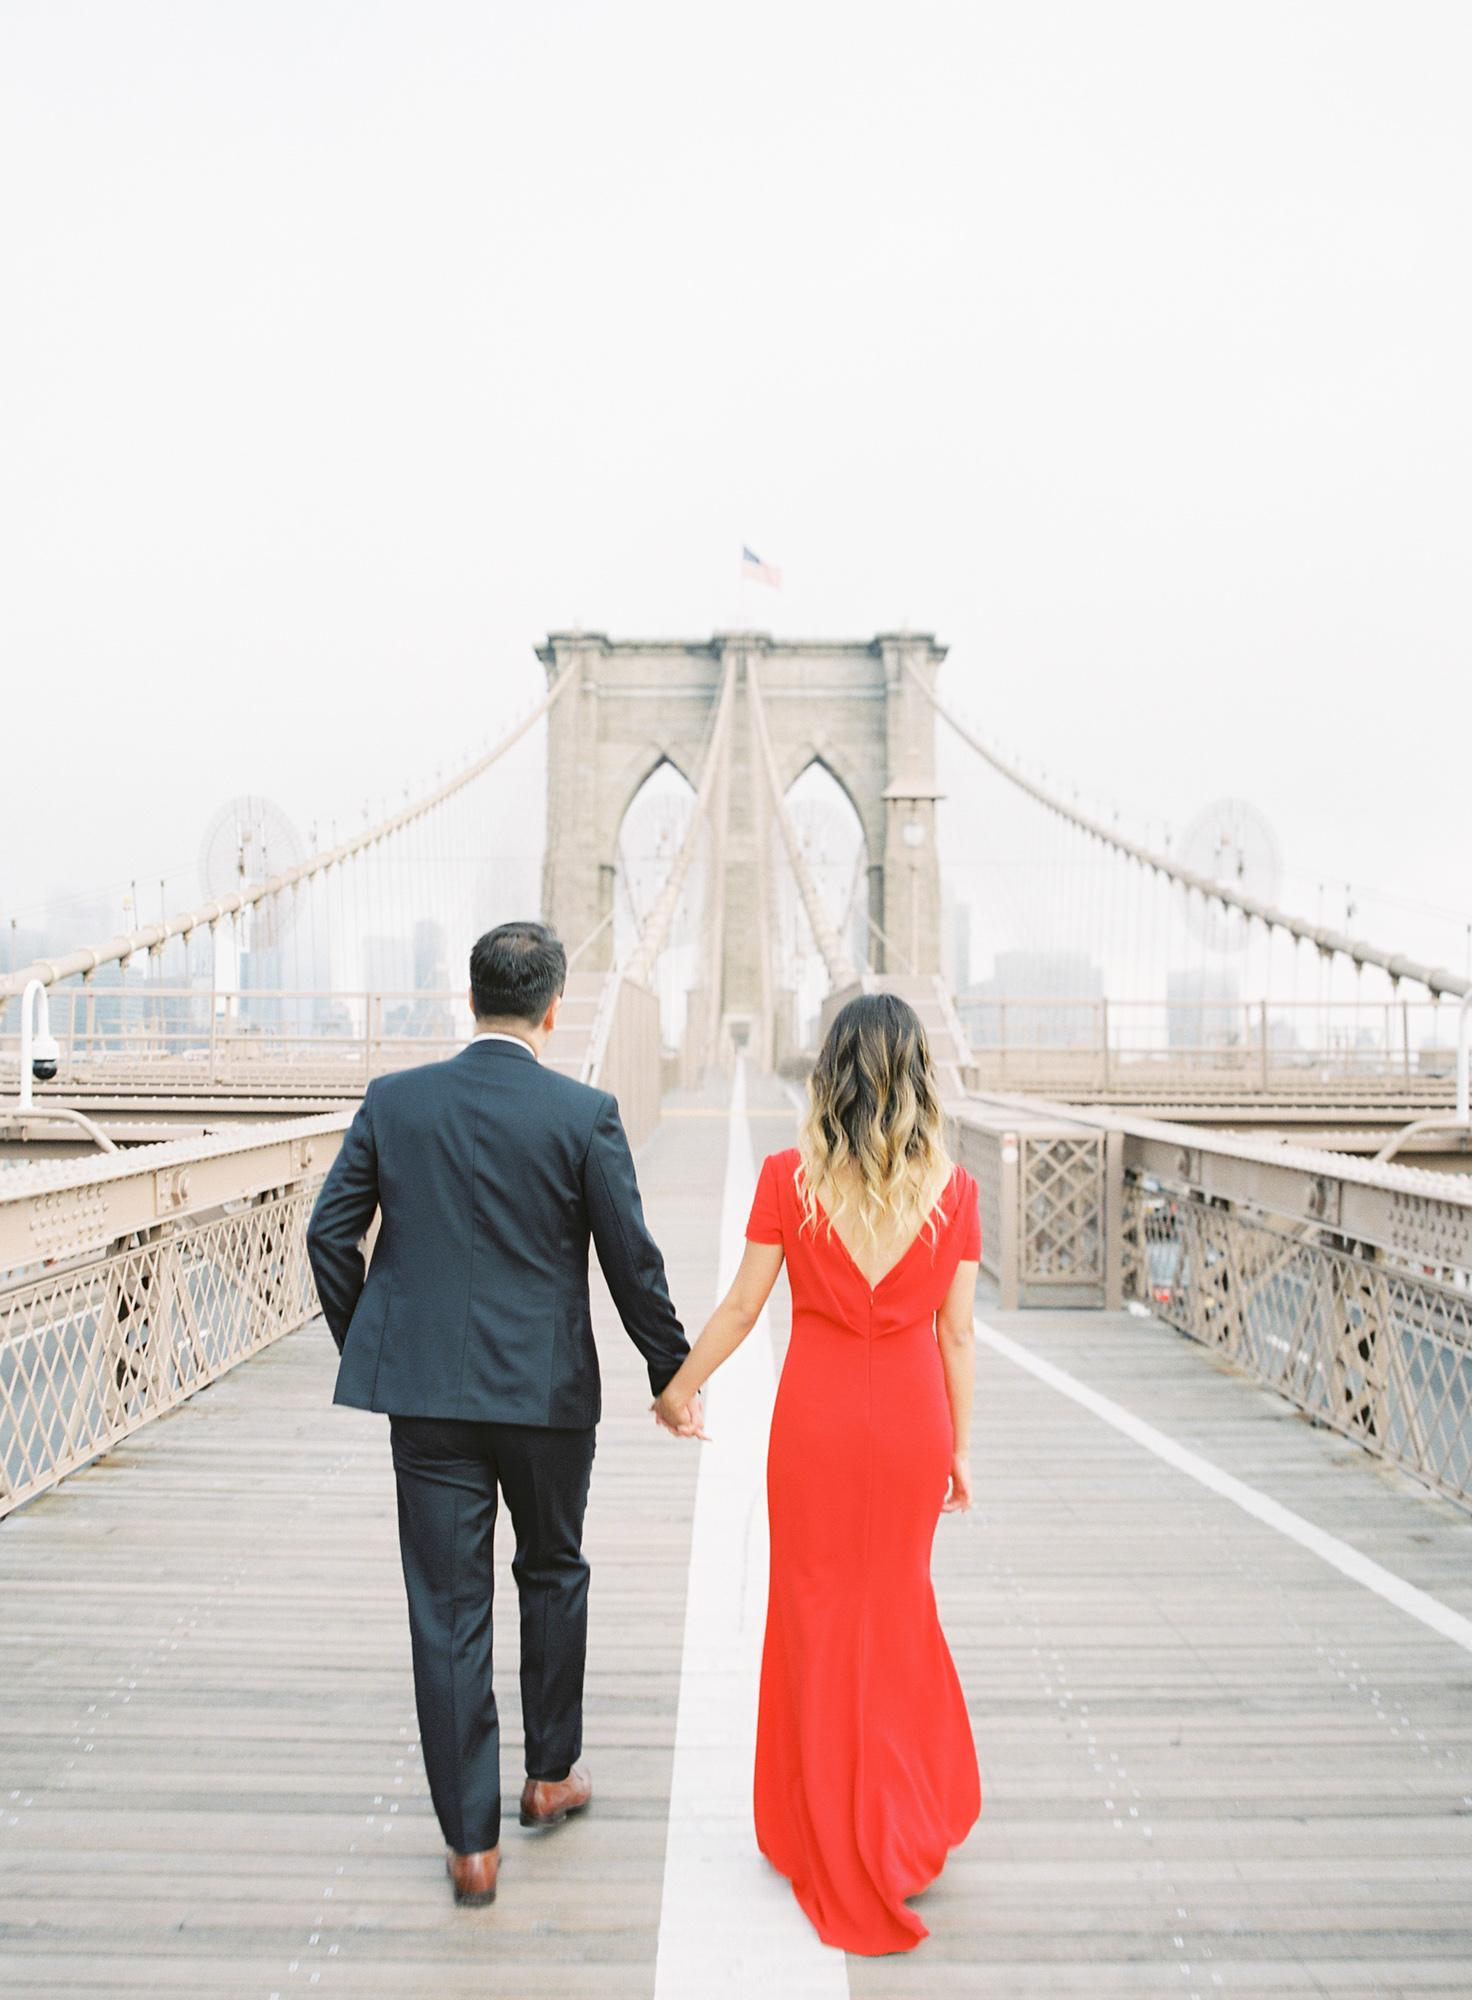 New-York-Film-Engagement-Session-Brooklyn-Bridge-Central-Park-6.jpg